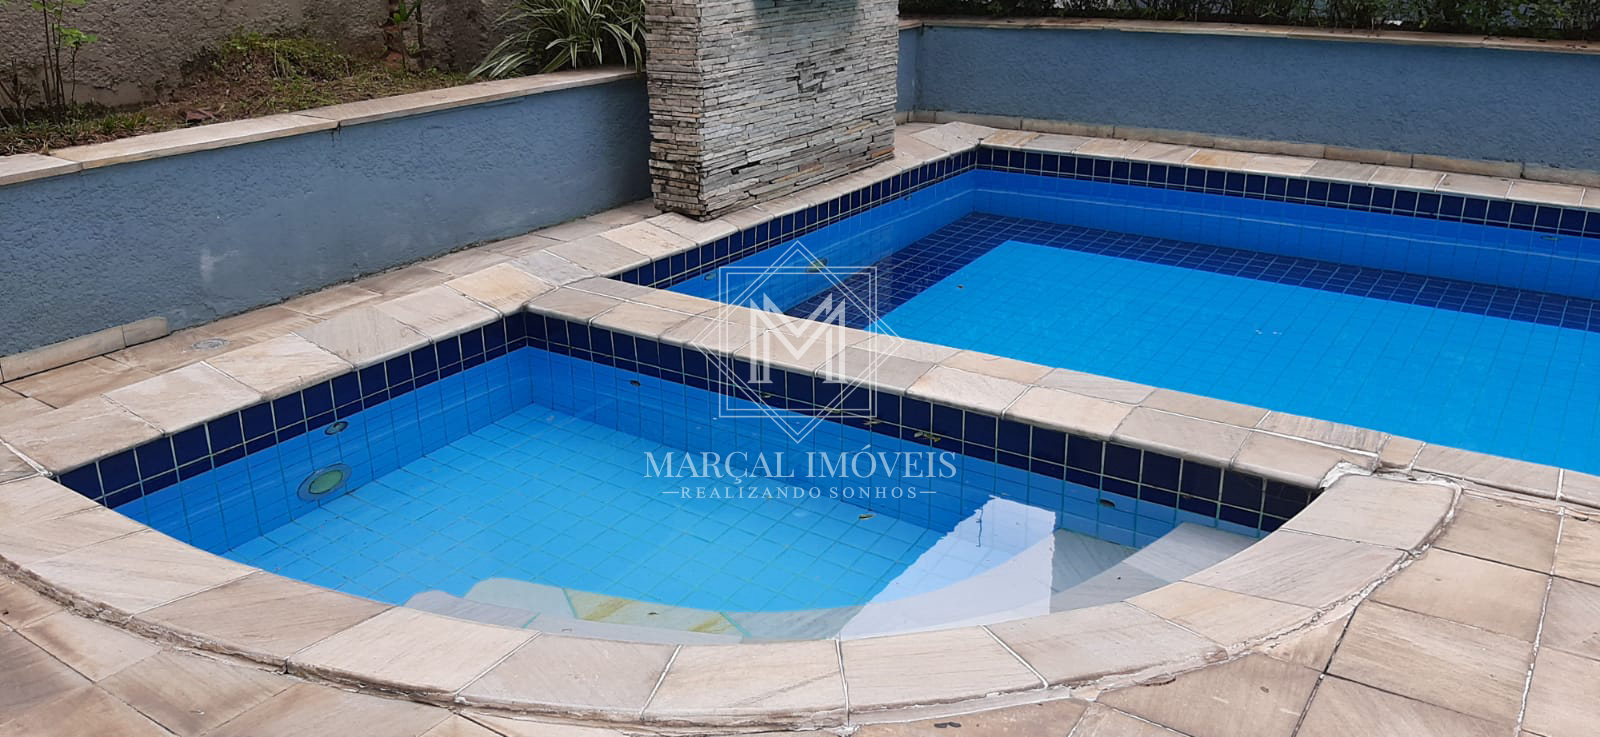 https://static.arboimoveis.com.br/AP0005_MARCAL/apartamentoavendabalnearioangradosreisrj_1628867372792_watermark.jpg